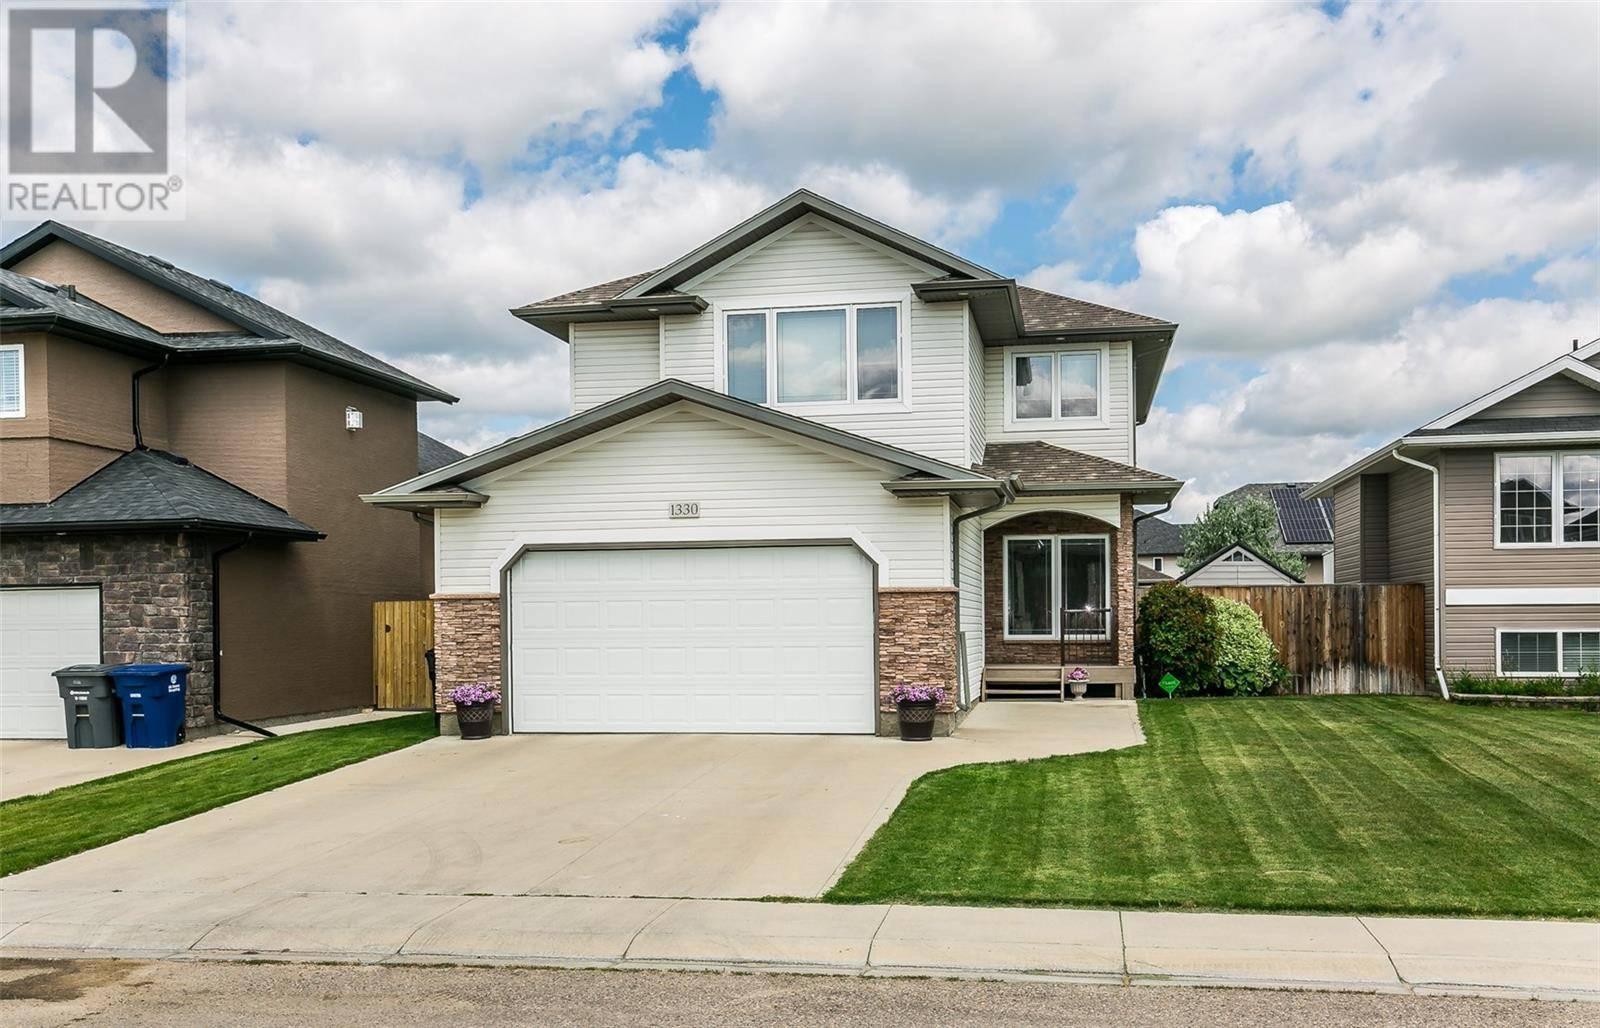 House for sale at 1330 Shepherd Cres Saskatoon Saskatchewan - MLS: SK790189